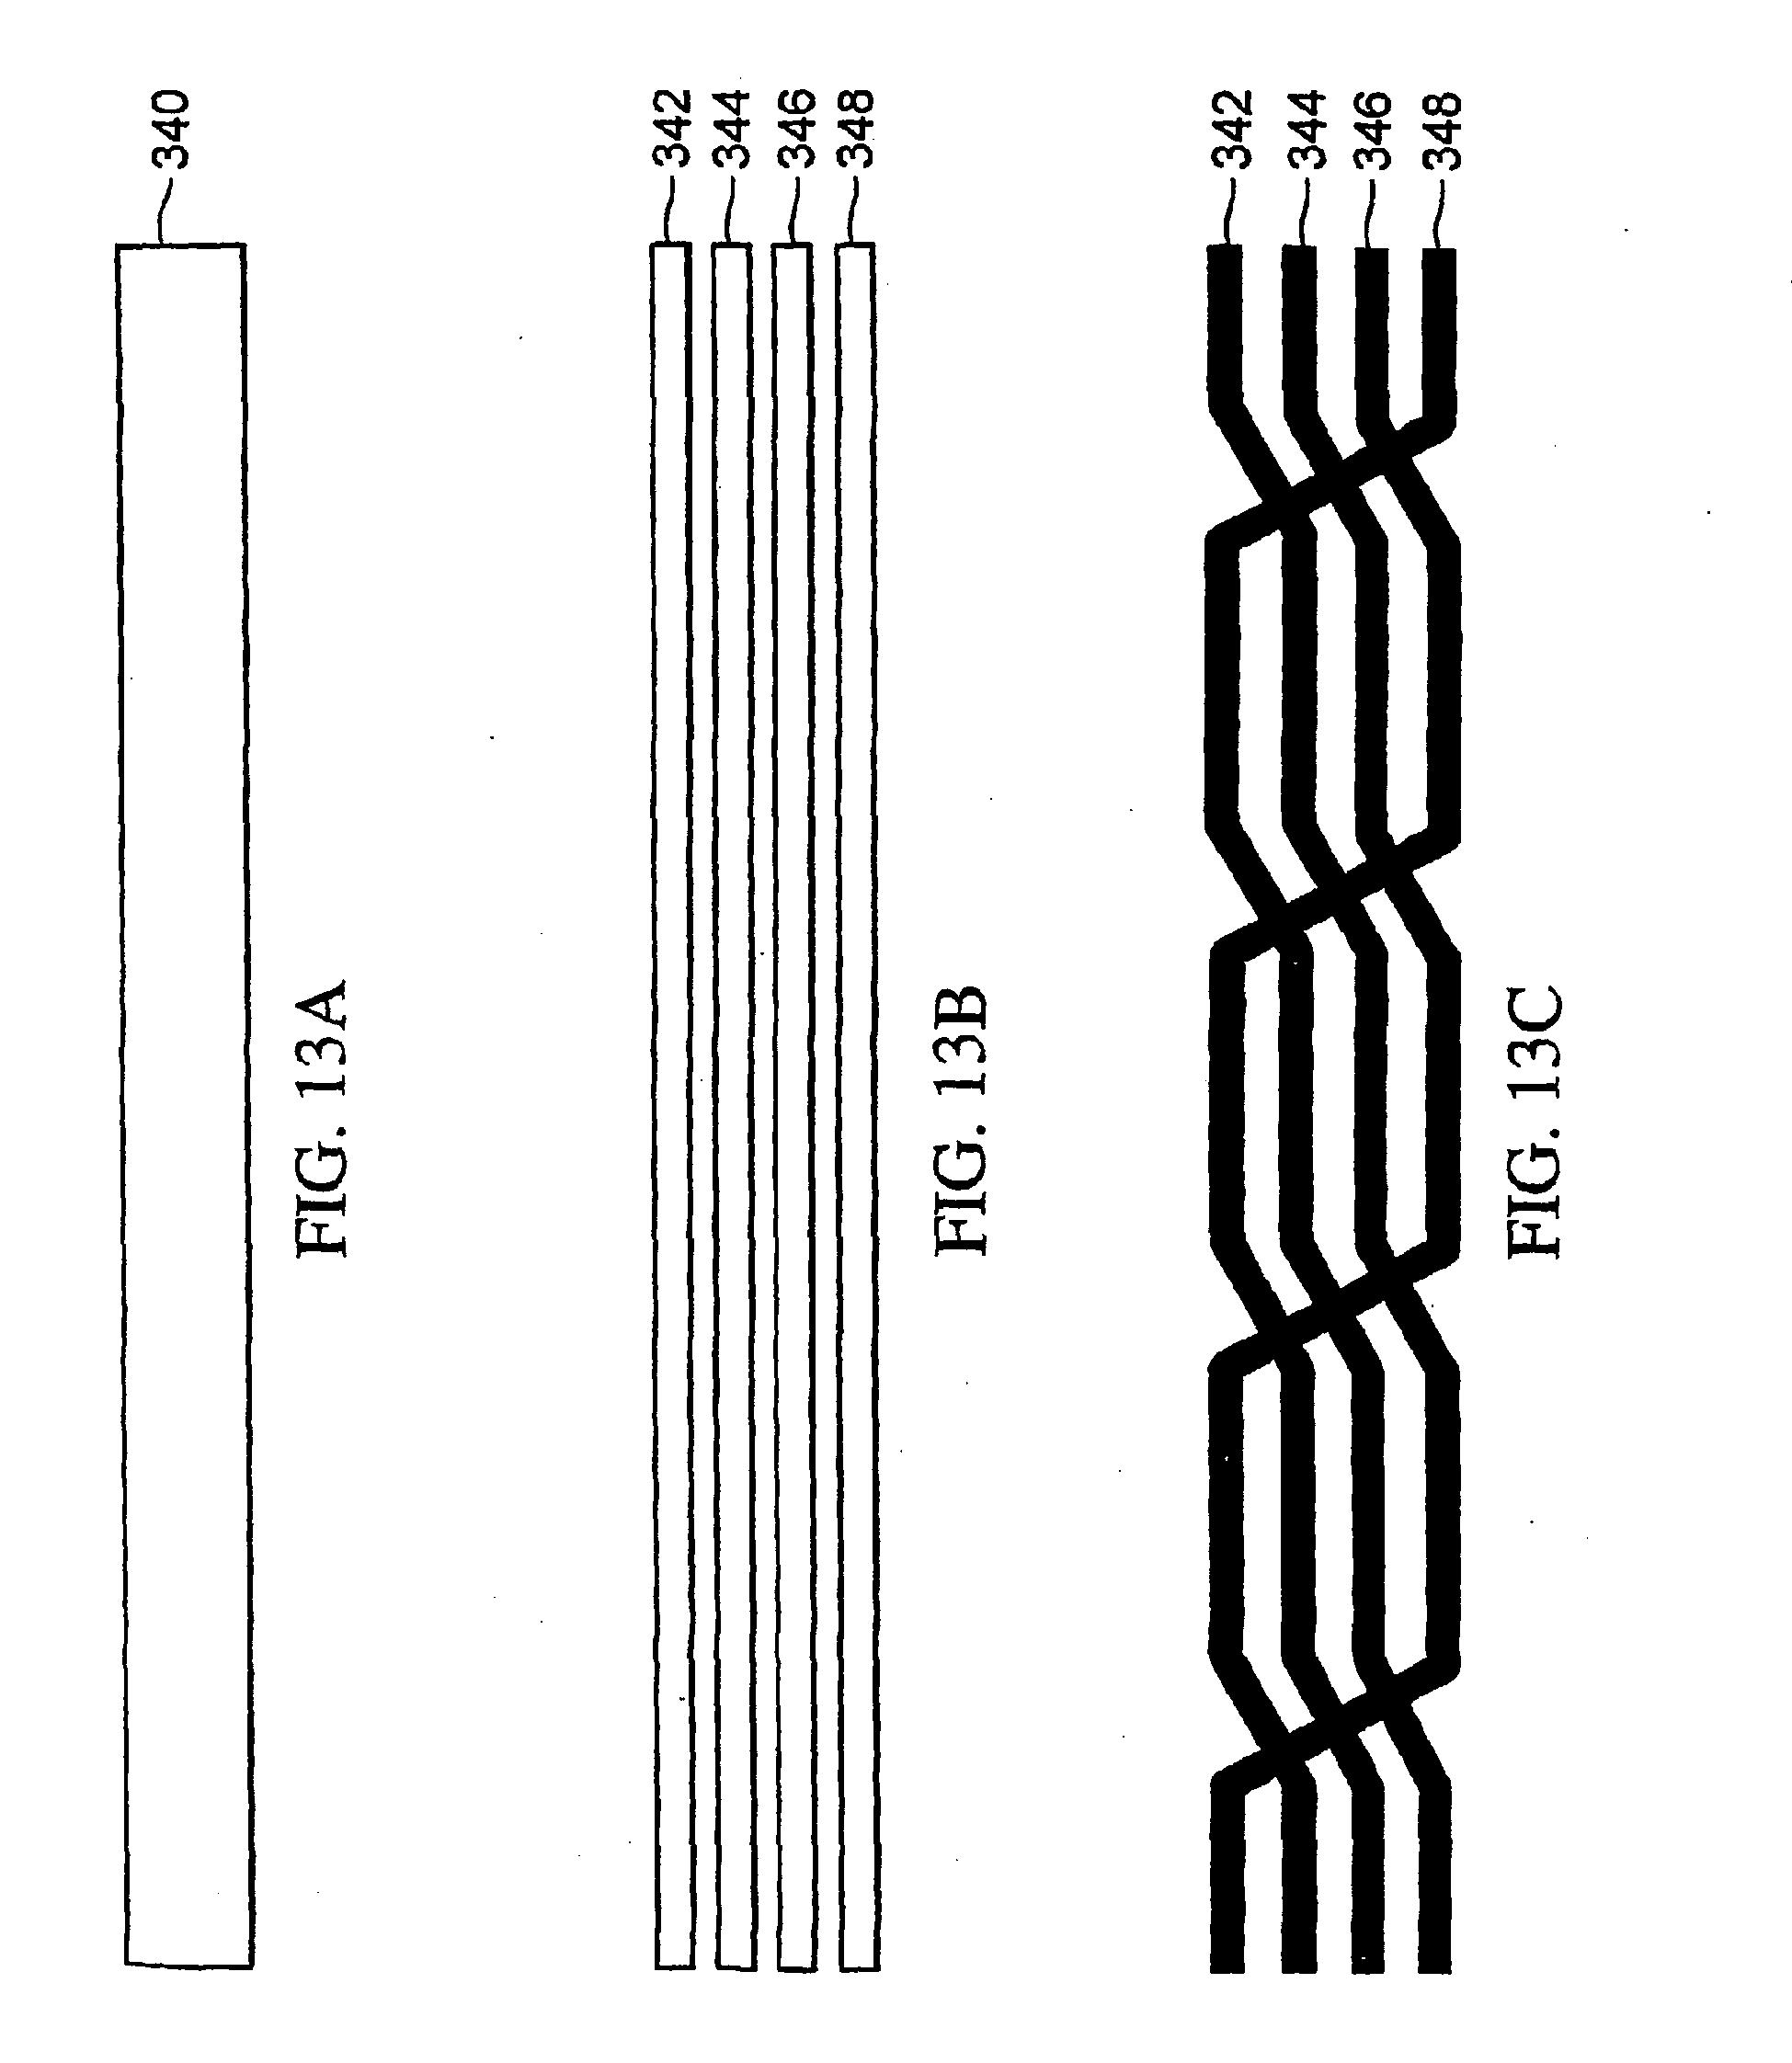 Wiring Diagram Furthermore Honda 400ex Carburetor Diagram On Diagrams